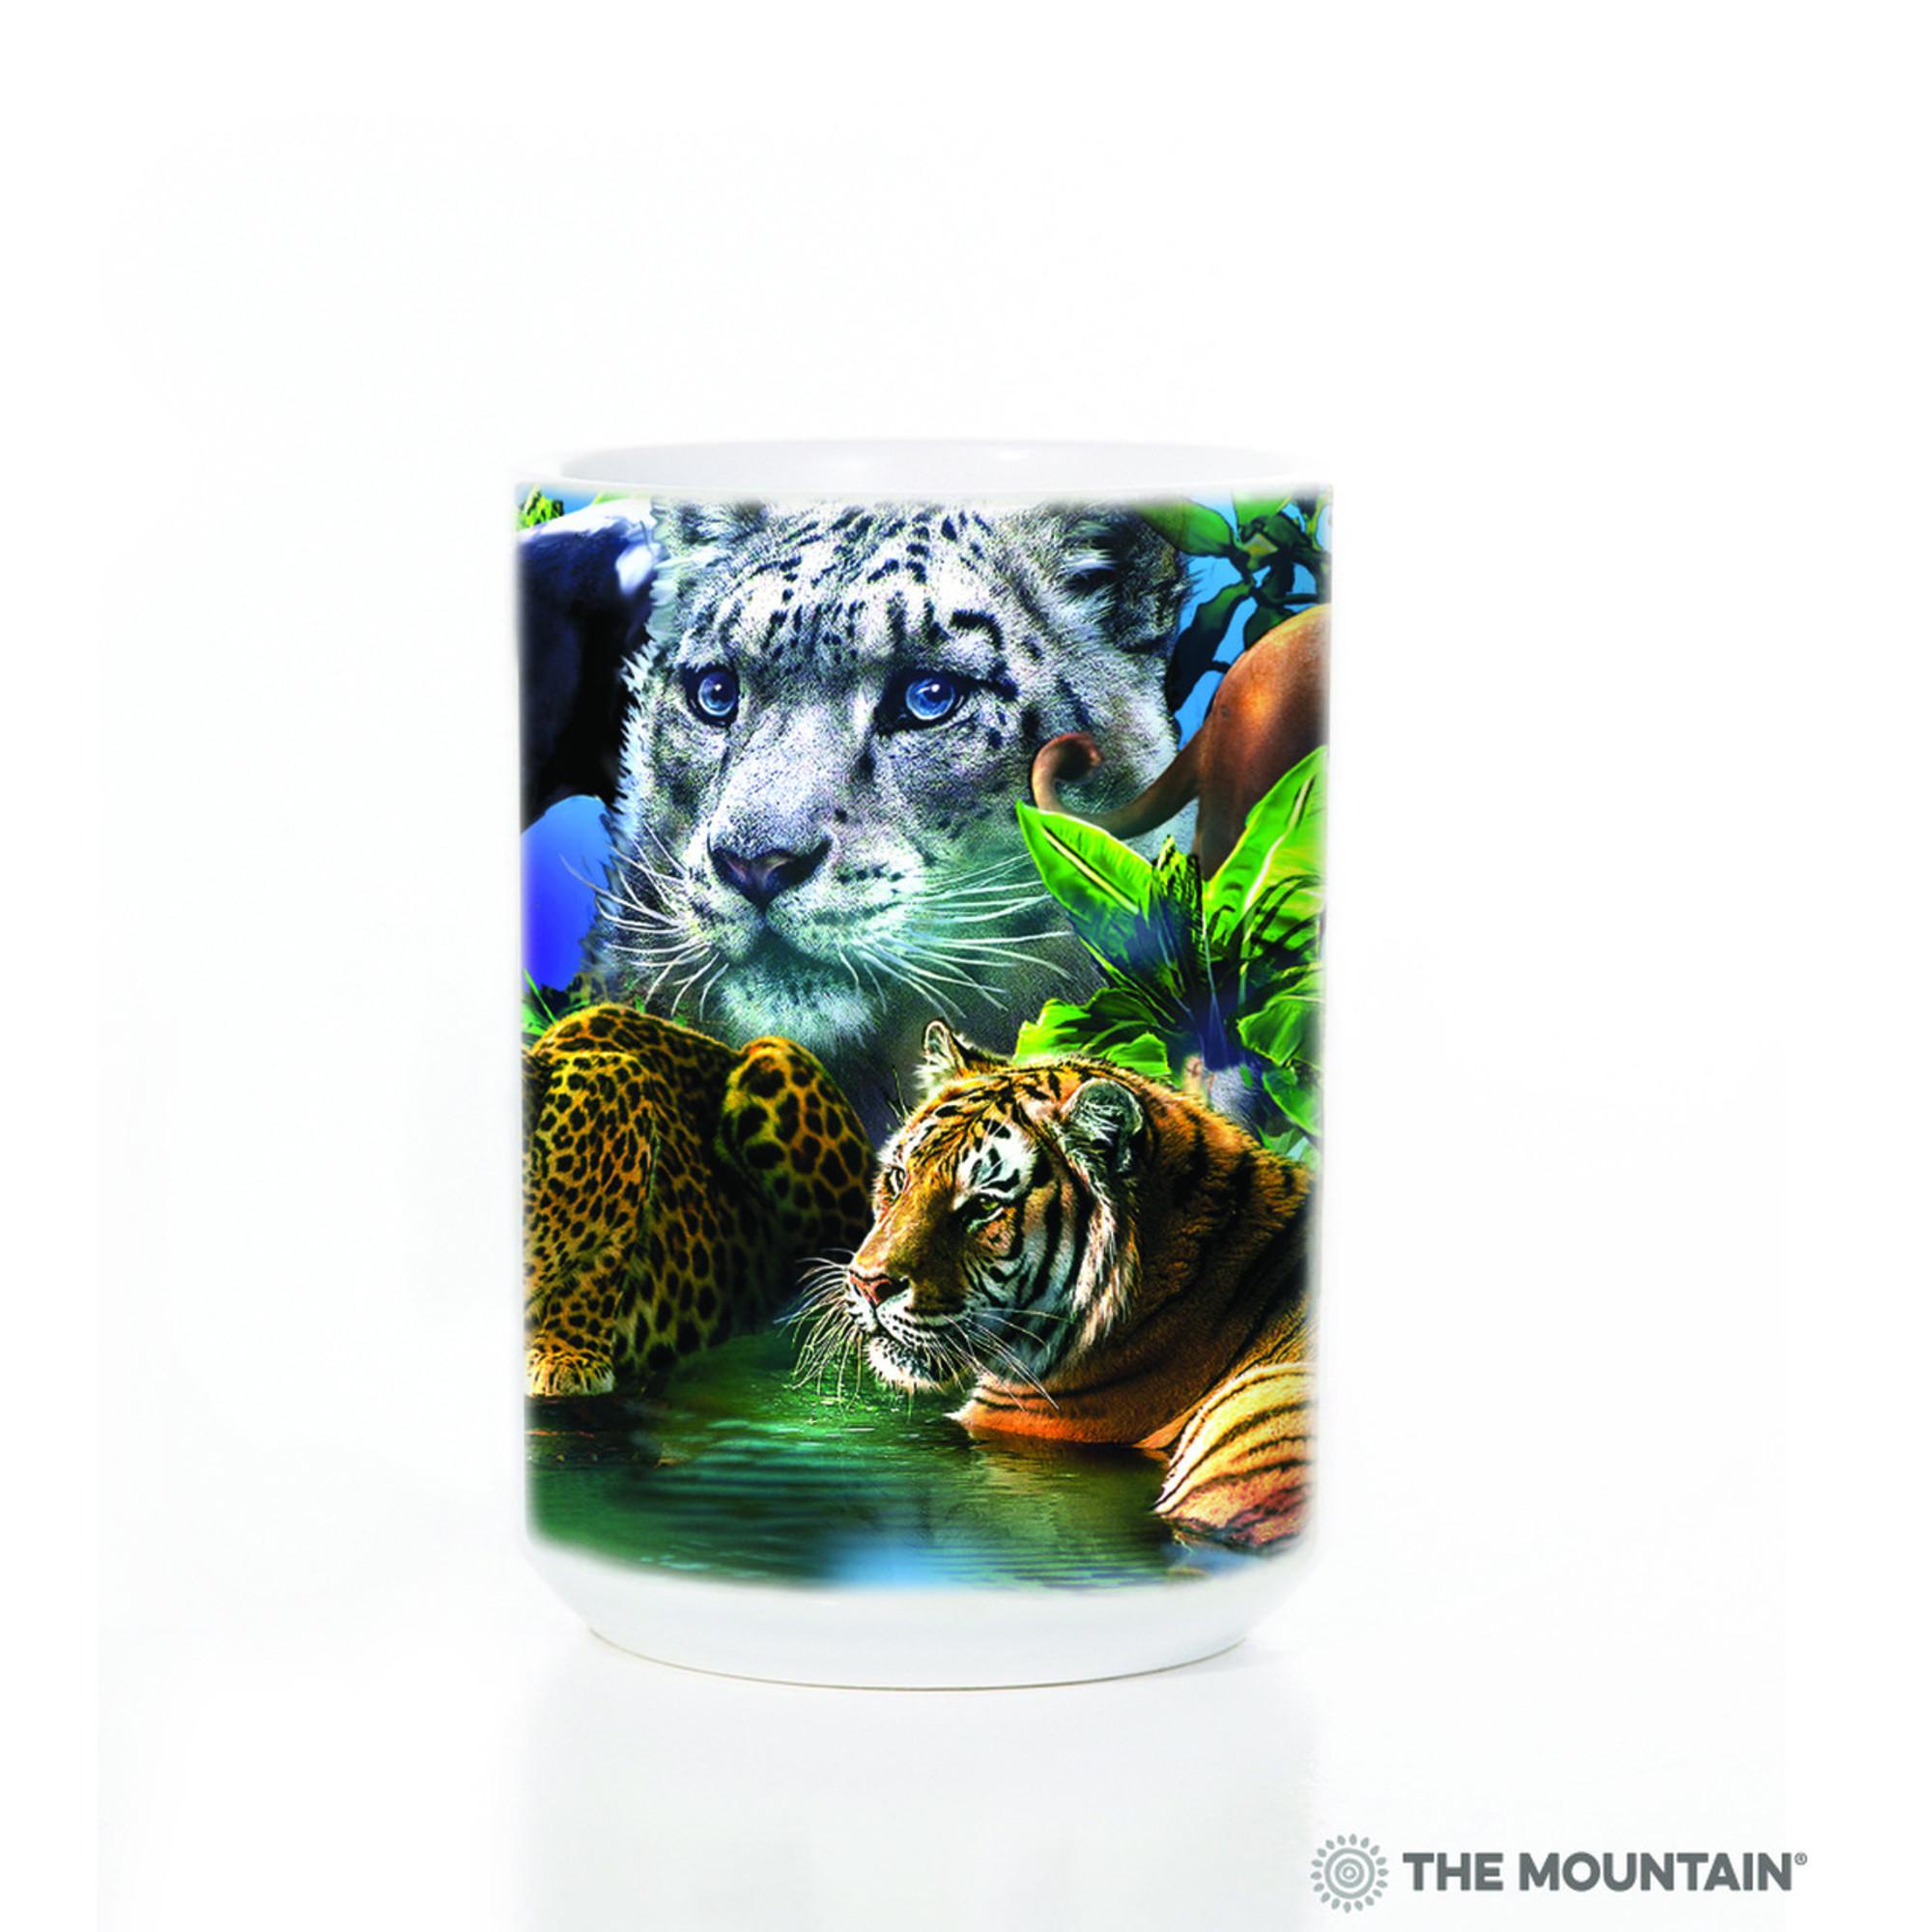 The Mountain Big Jungle Cats